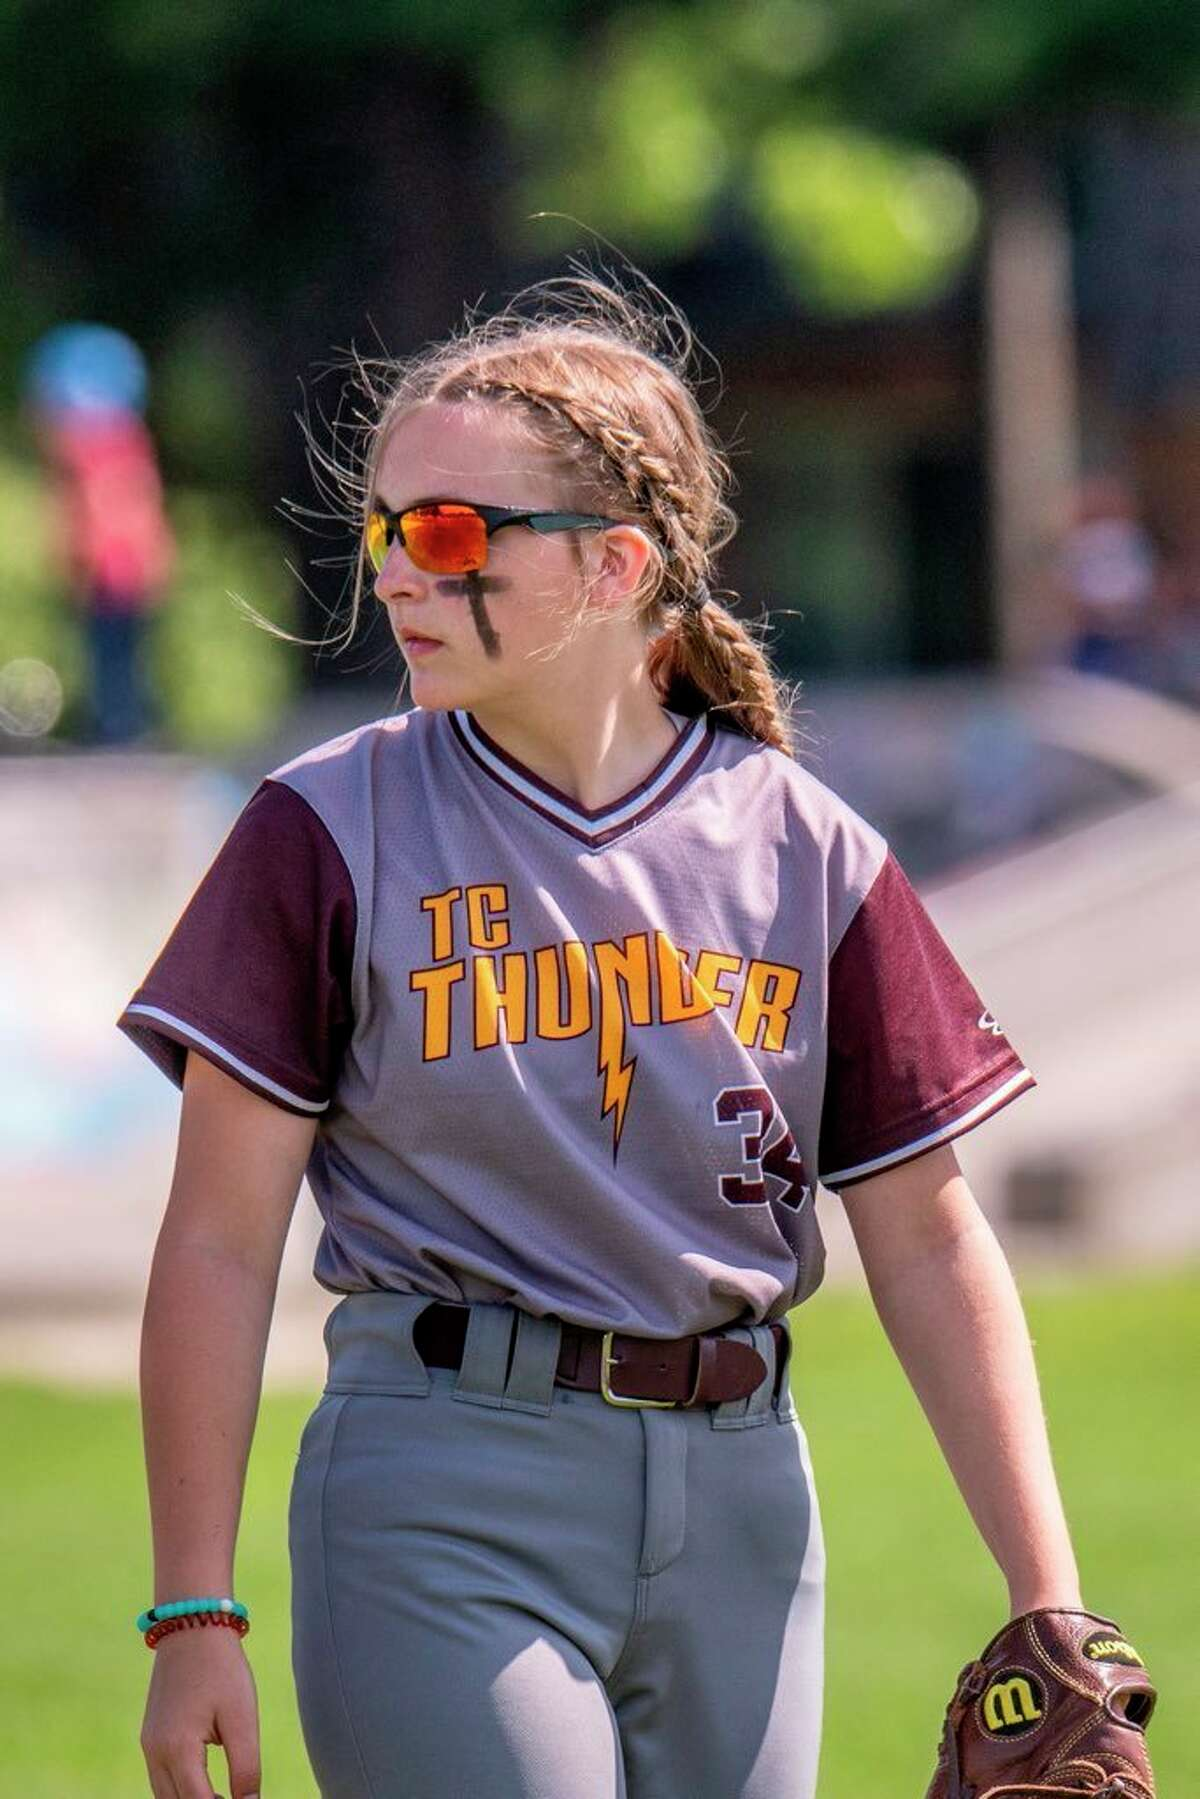 Erin Riesenberg of Chippewa Hills had a strong season for the Traverse City Thunder 14U softball team. (Courtesy photo)